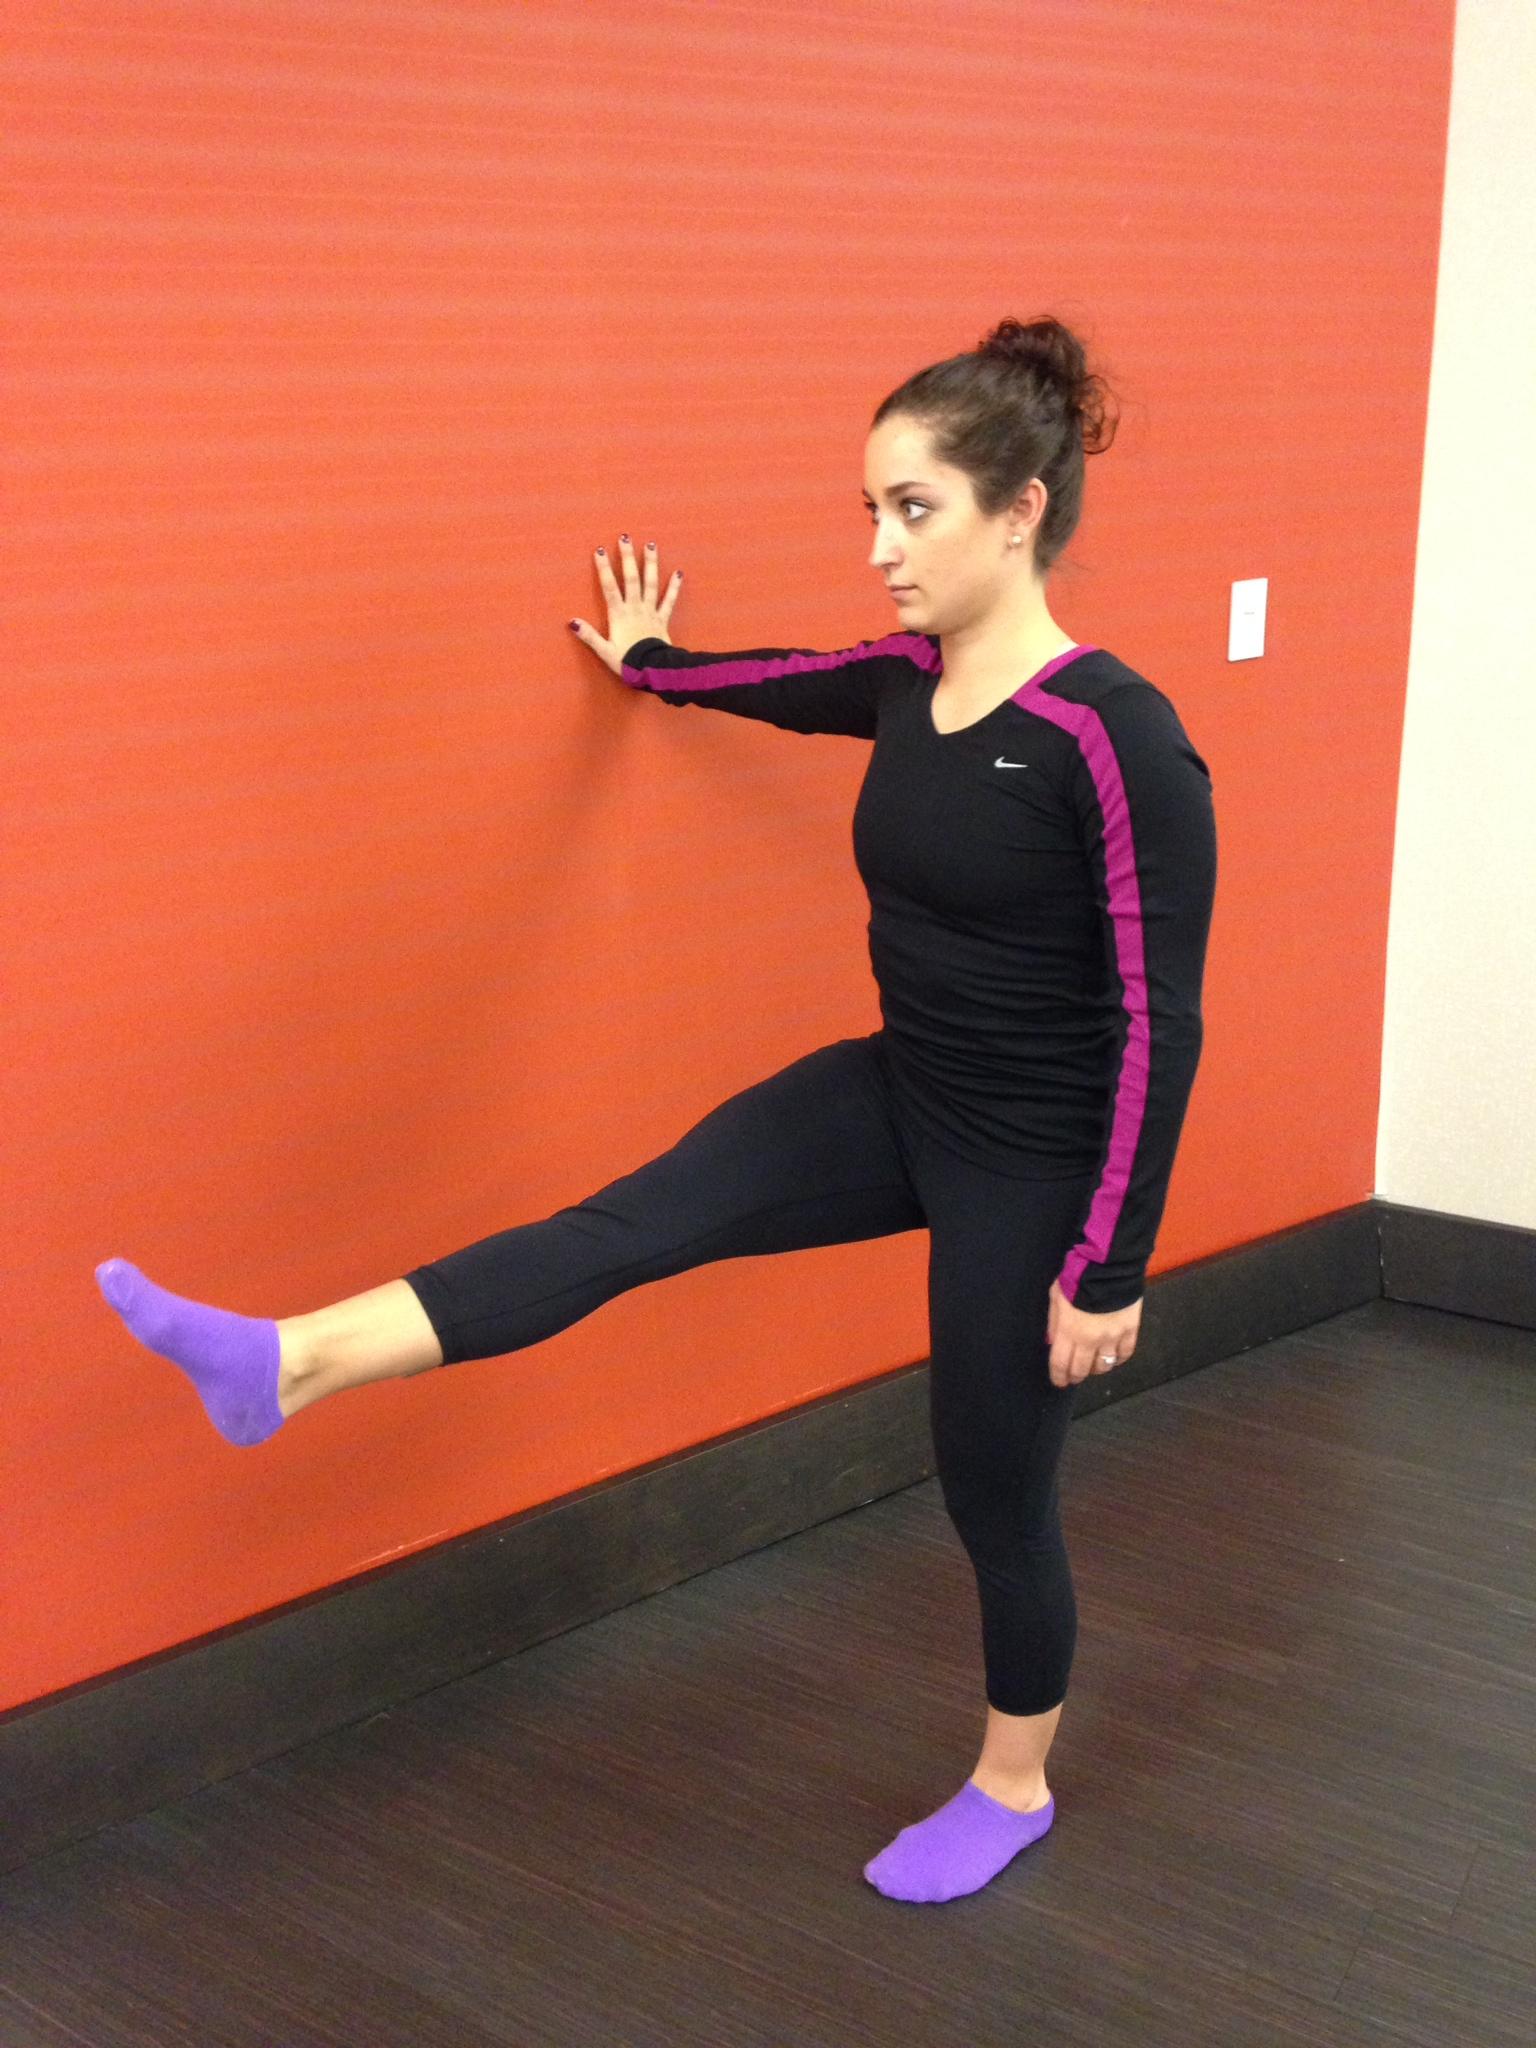 Level 3 - Dynamic Flexibility  Leg Swings